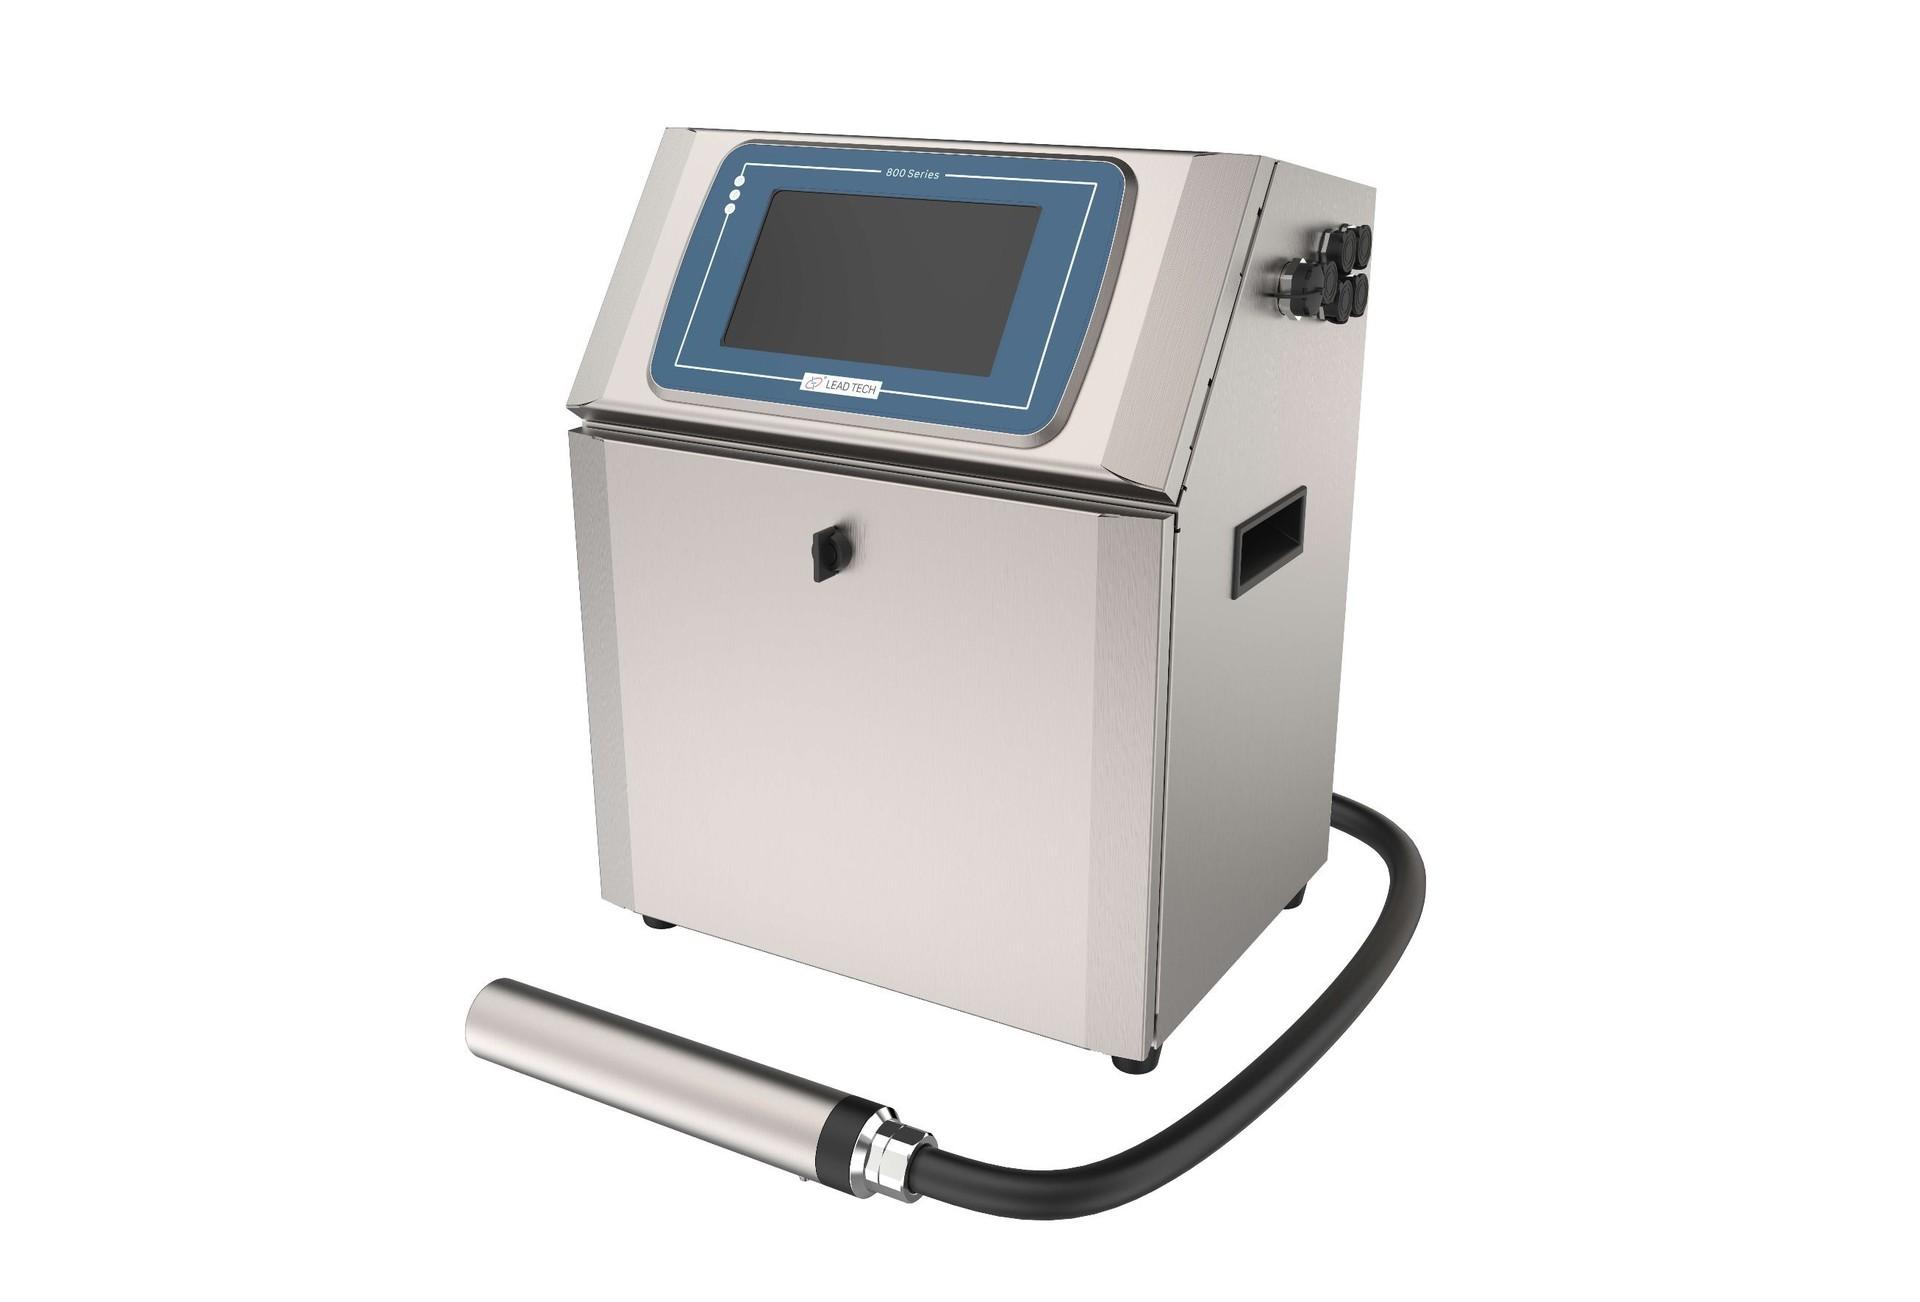 Lead Tech Lt800 Black to Red Coding Cij Inkjet Printer for Beer Printing